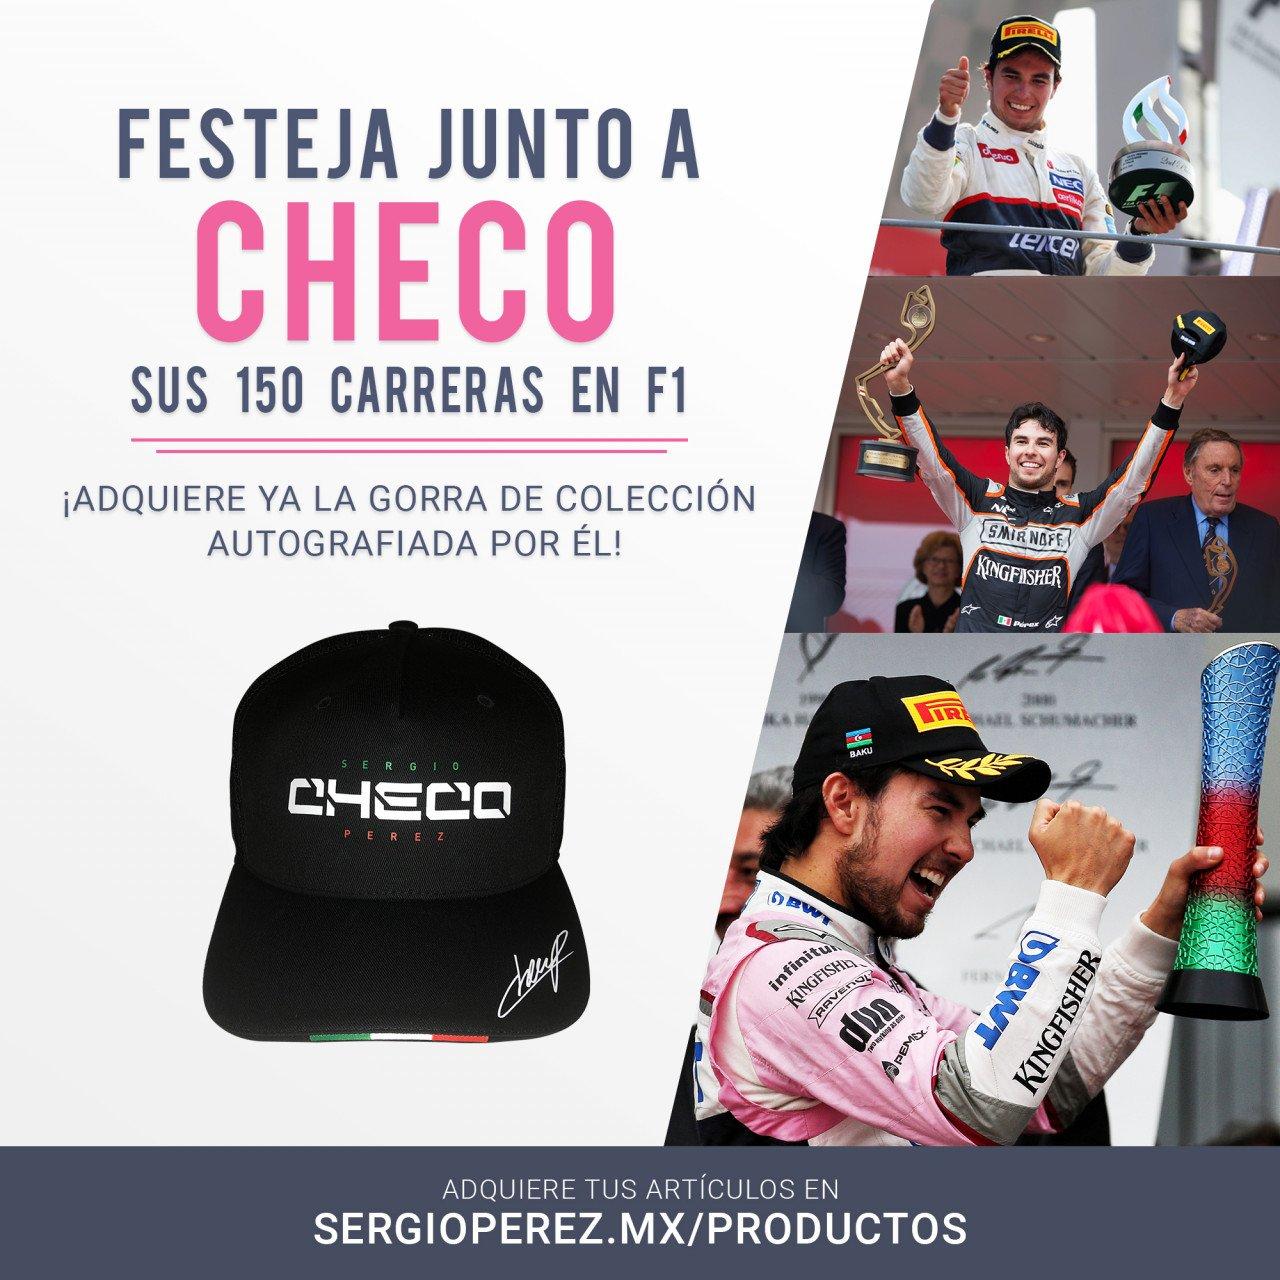 Gorra Checo Pérez 2018 autografiada por él